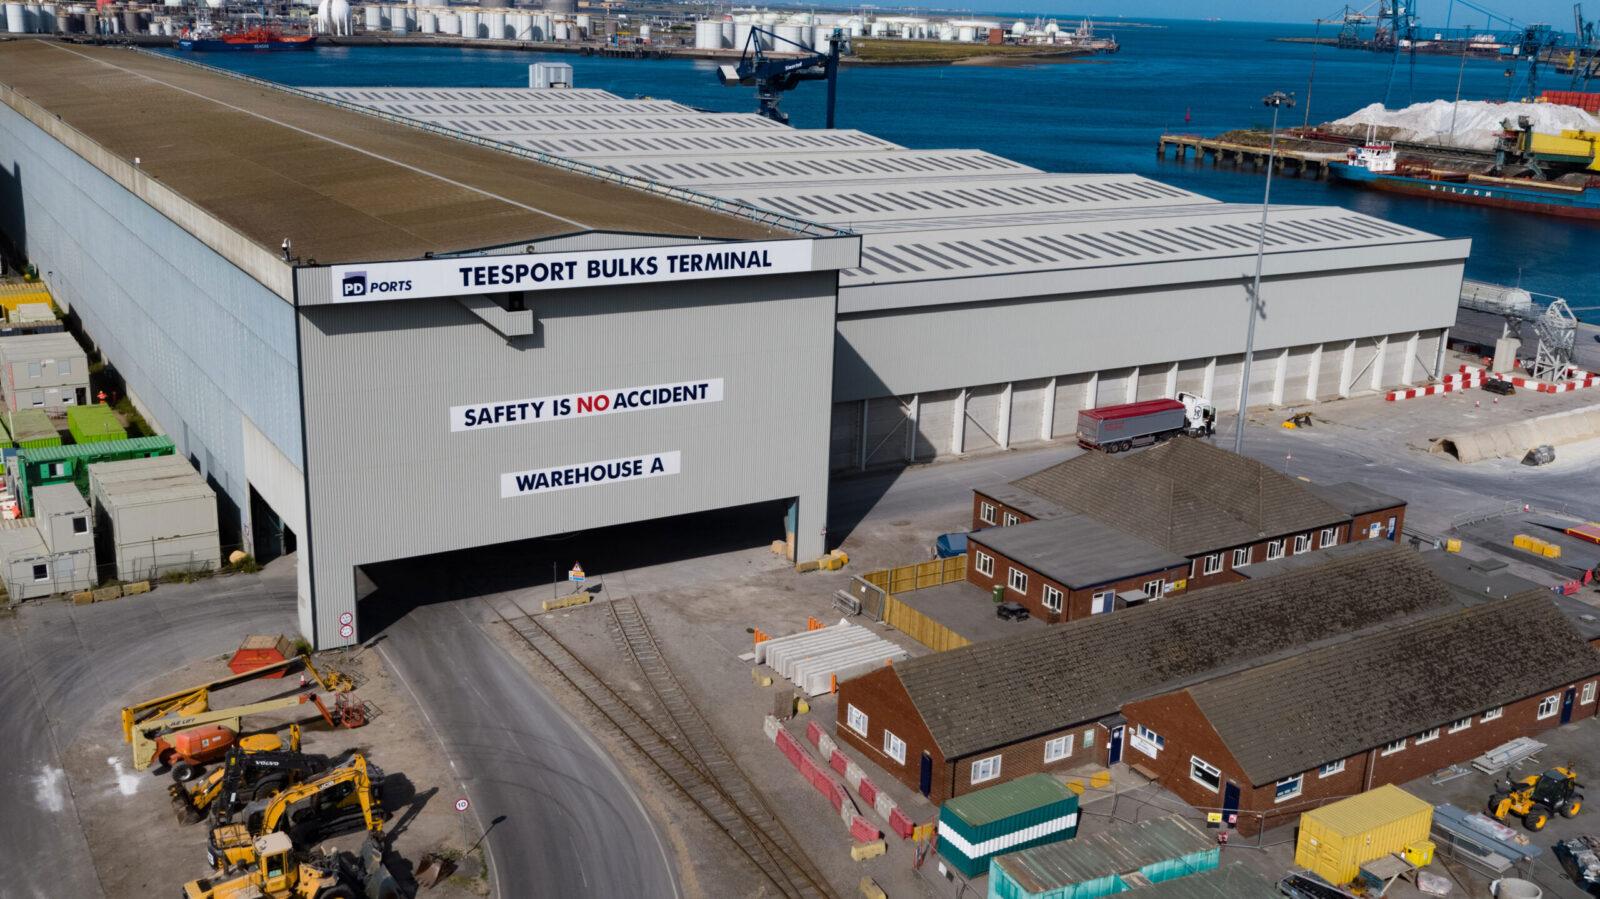 Teesport Bulks Terminal